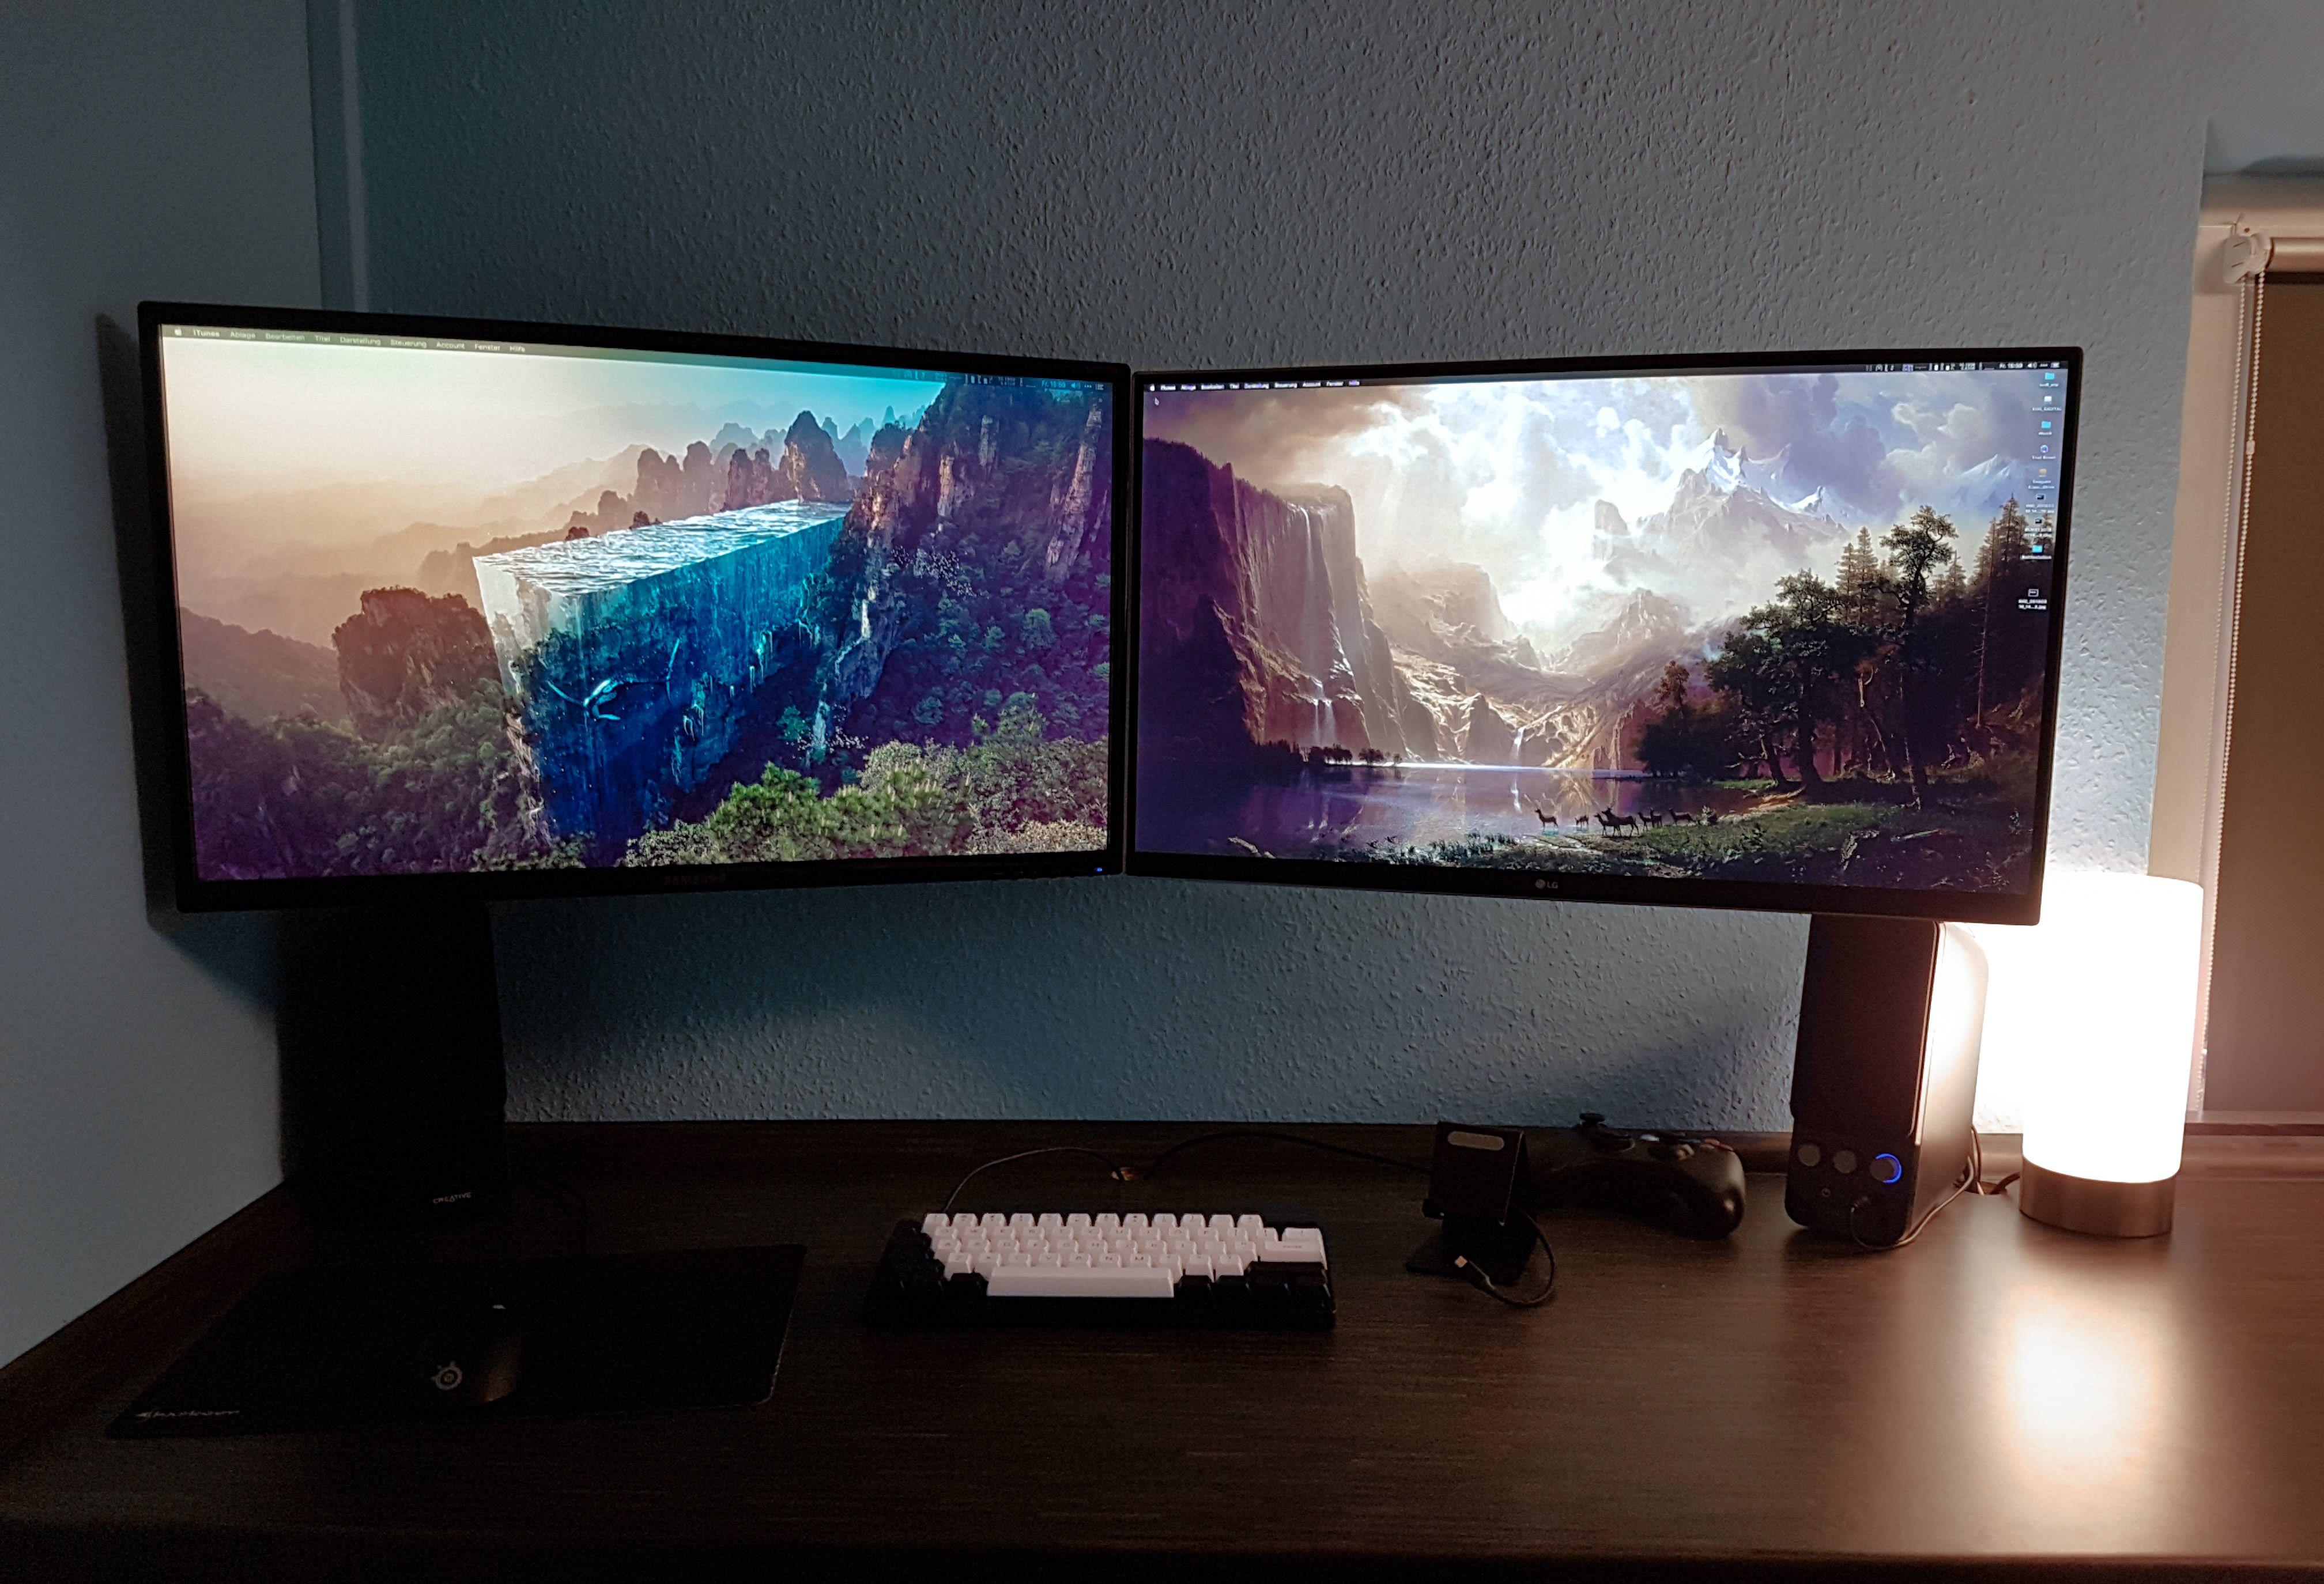 I Should Ve Bought Two 4k Monitors Instead Of Just One Battlestation Custom Pc Gaming Setup Benq gl2460hm 24 inch 1080p led gaming